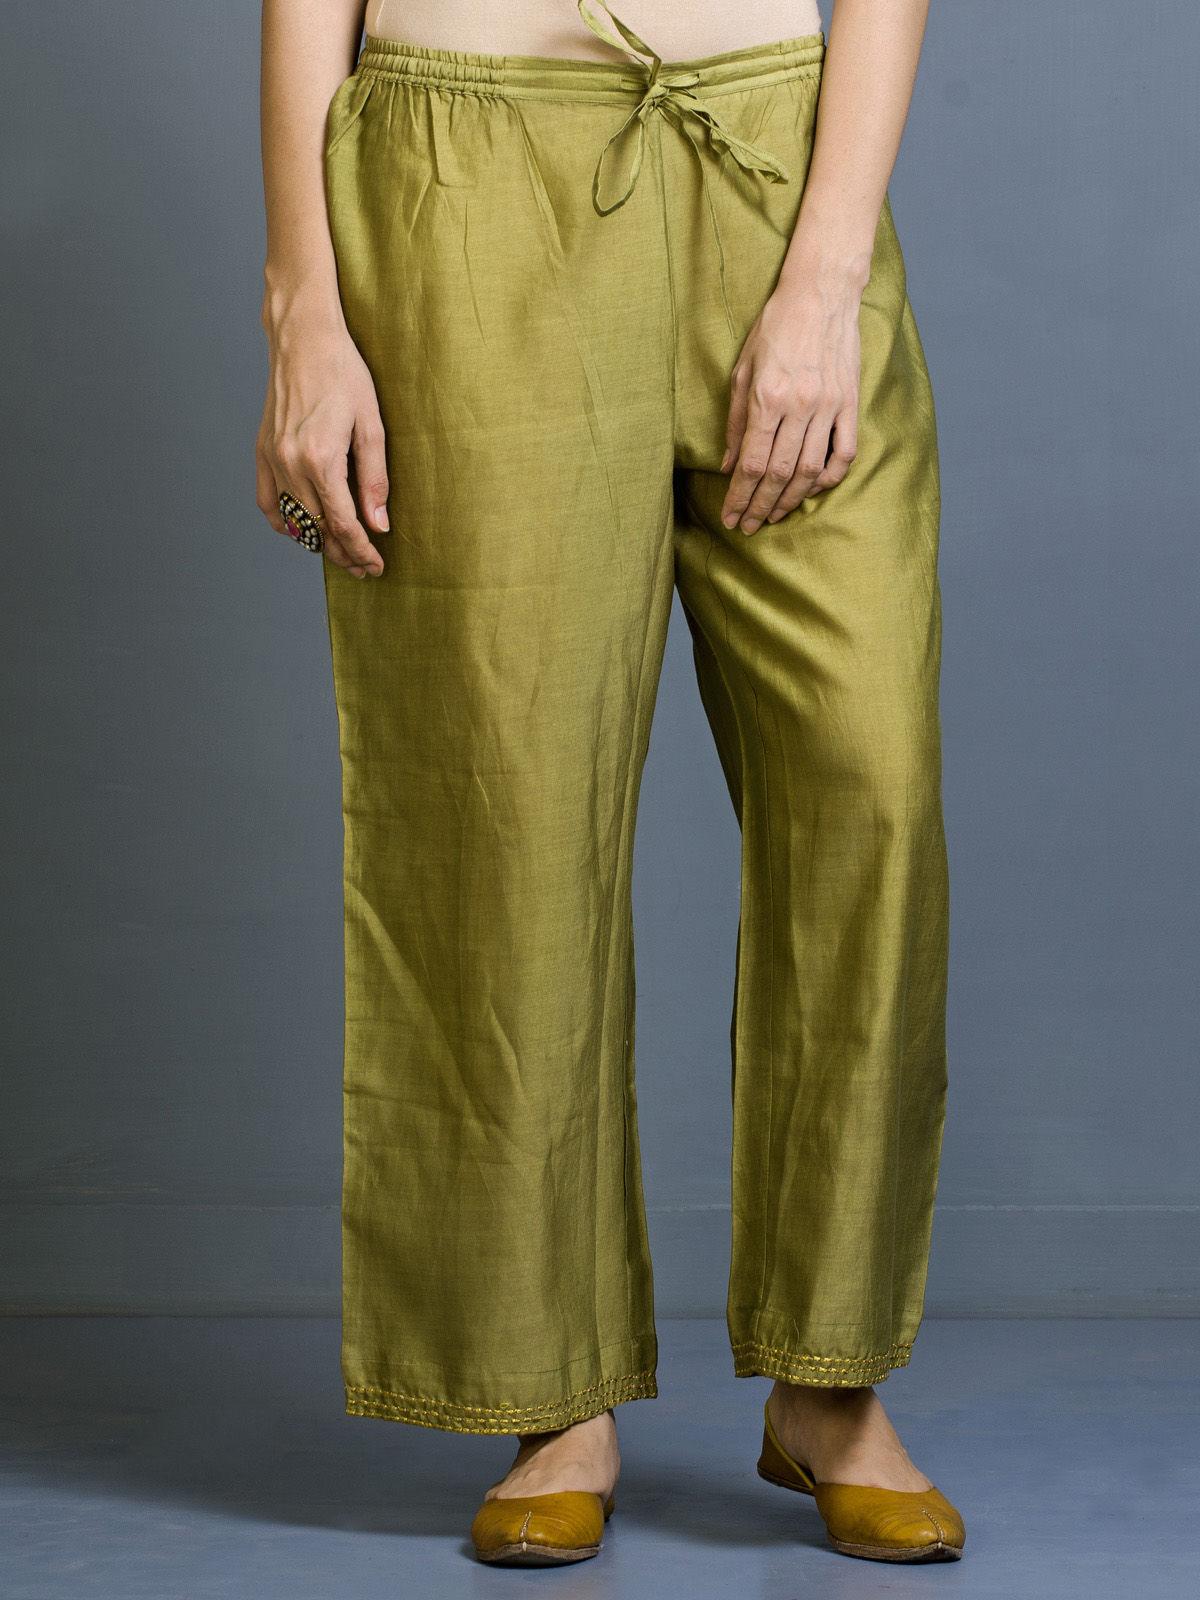 Shajara Chanderi Straight Fit Trousers